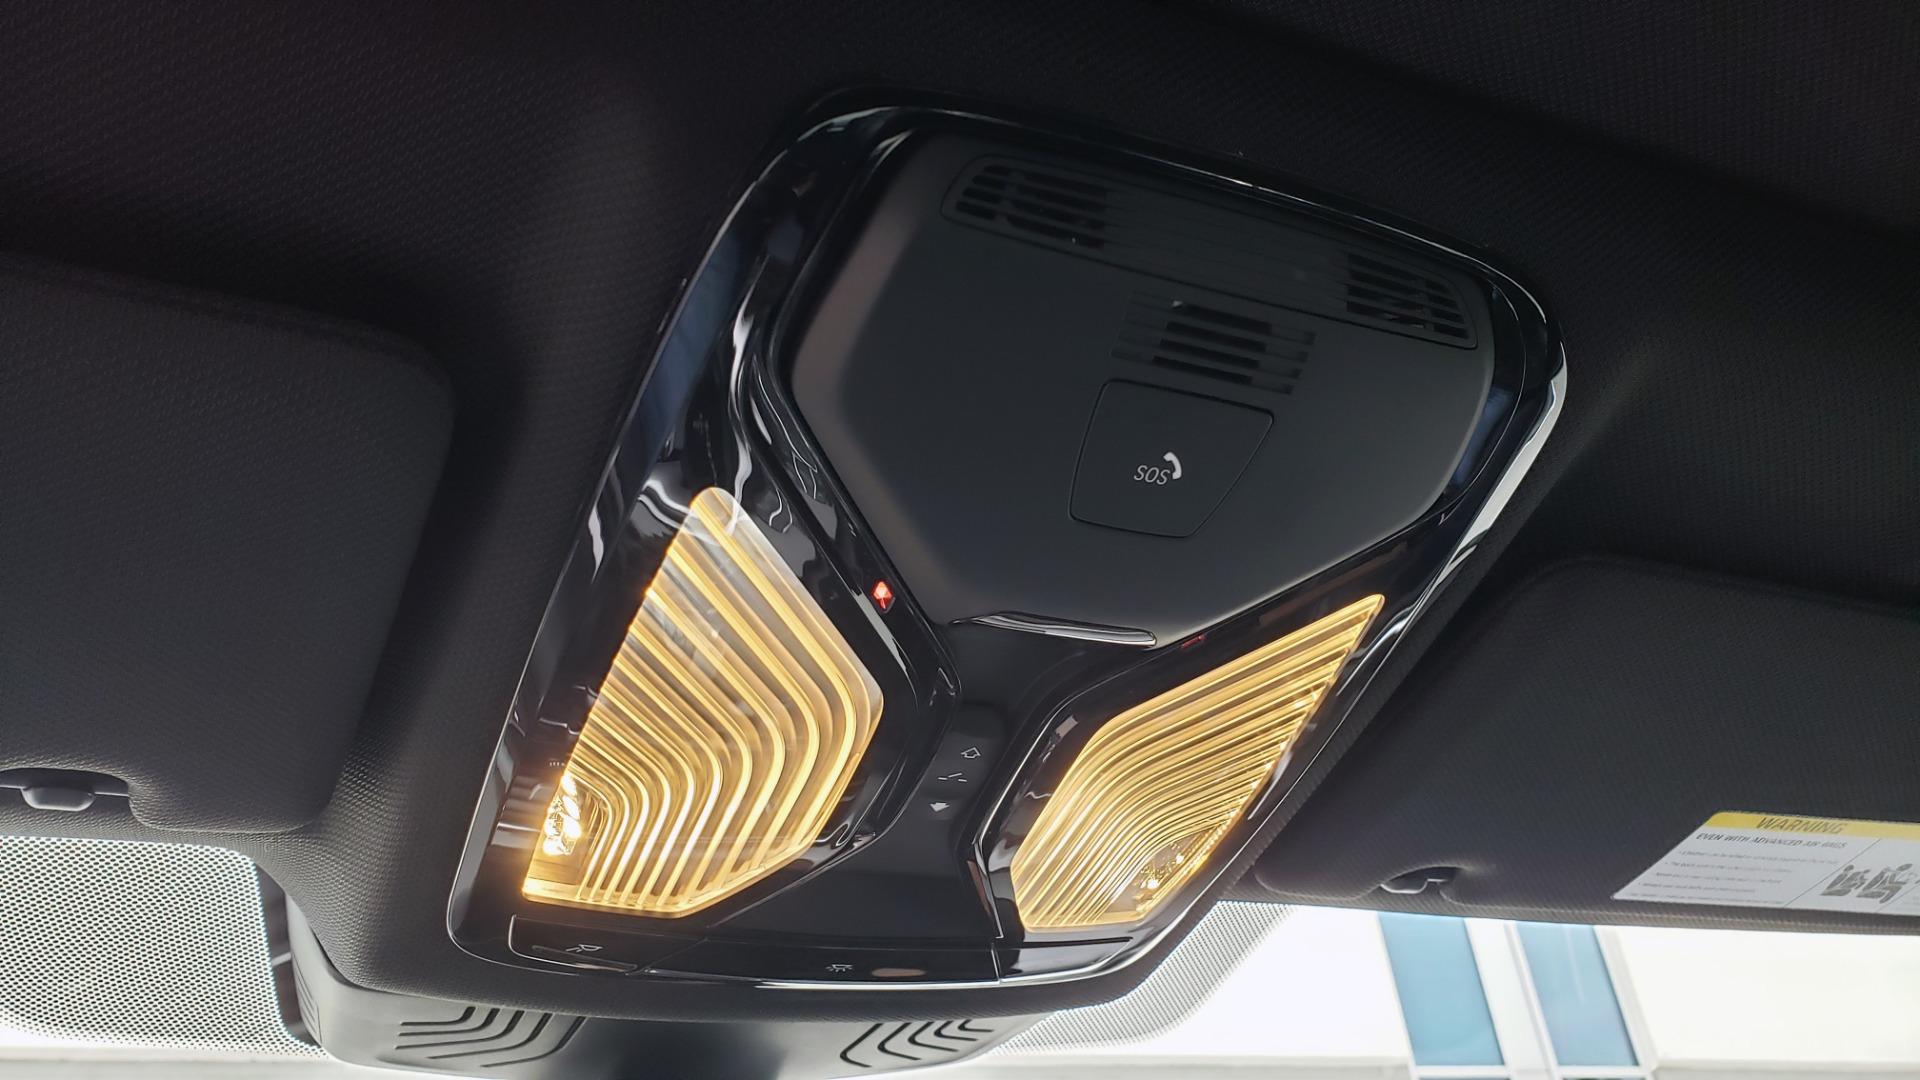 Used 2017 BMW 5 SERIES 530IXDRIVE / PREM PKG / DRVR ASST PLUS / CLD WTHR / APPLE CARPLAY for sale Sold at Formula Imports in Charlotte NC 28227 55